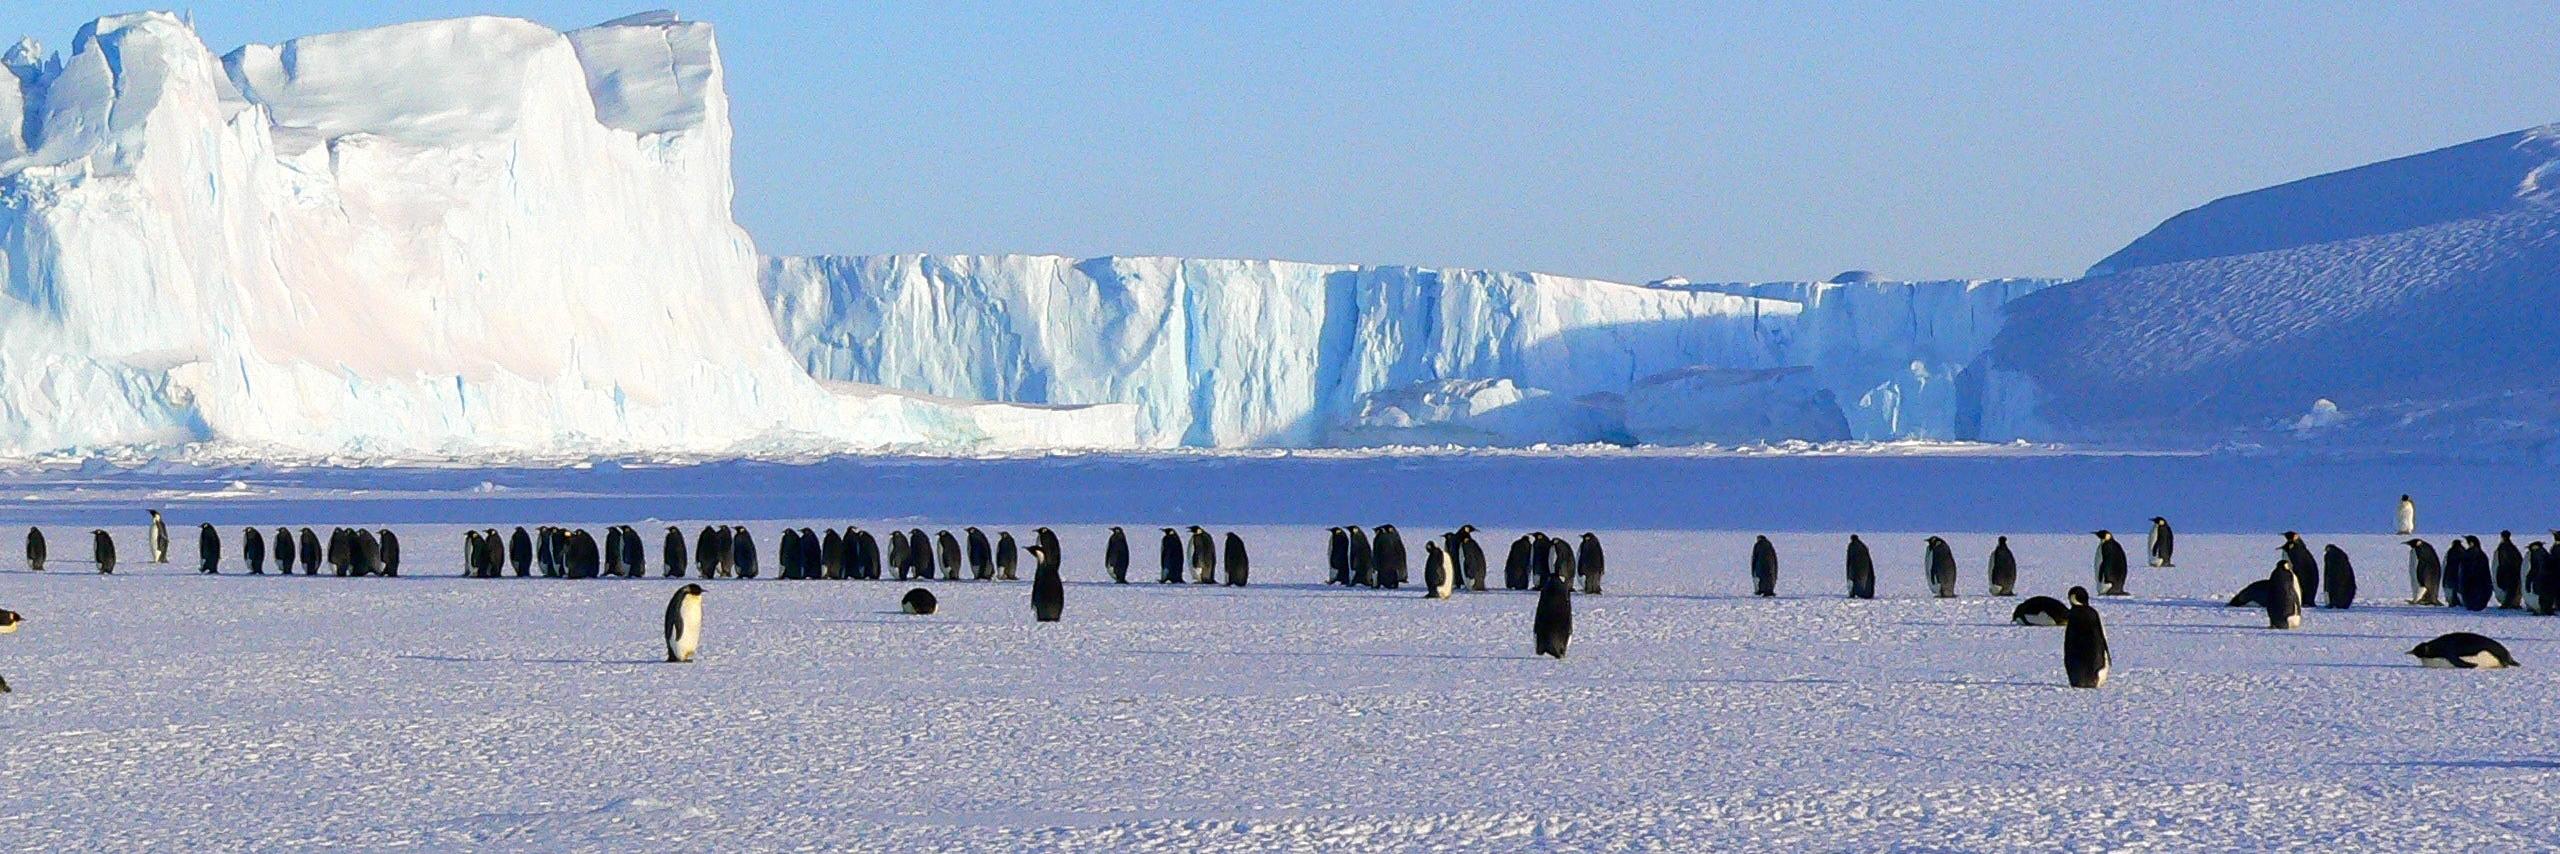 Antartica_20210513